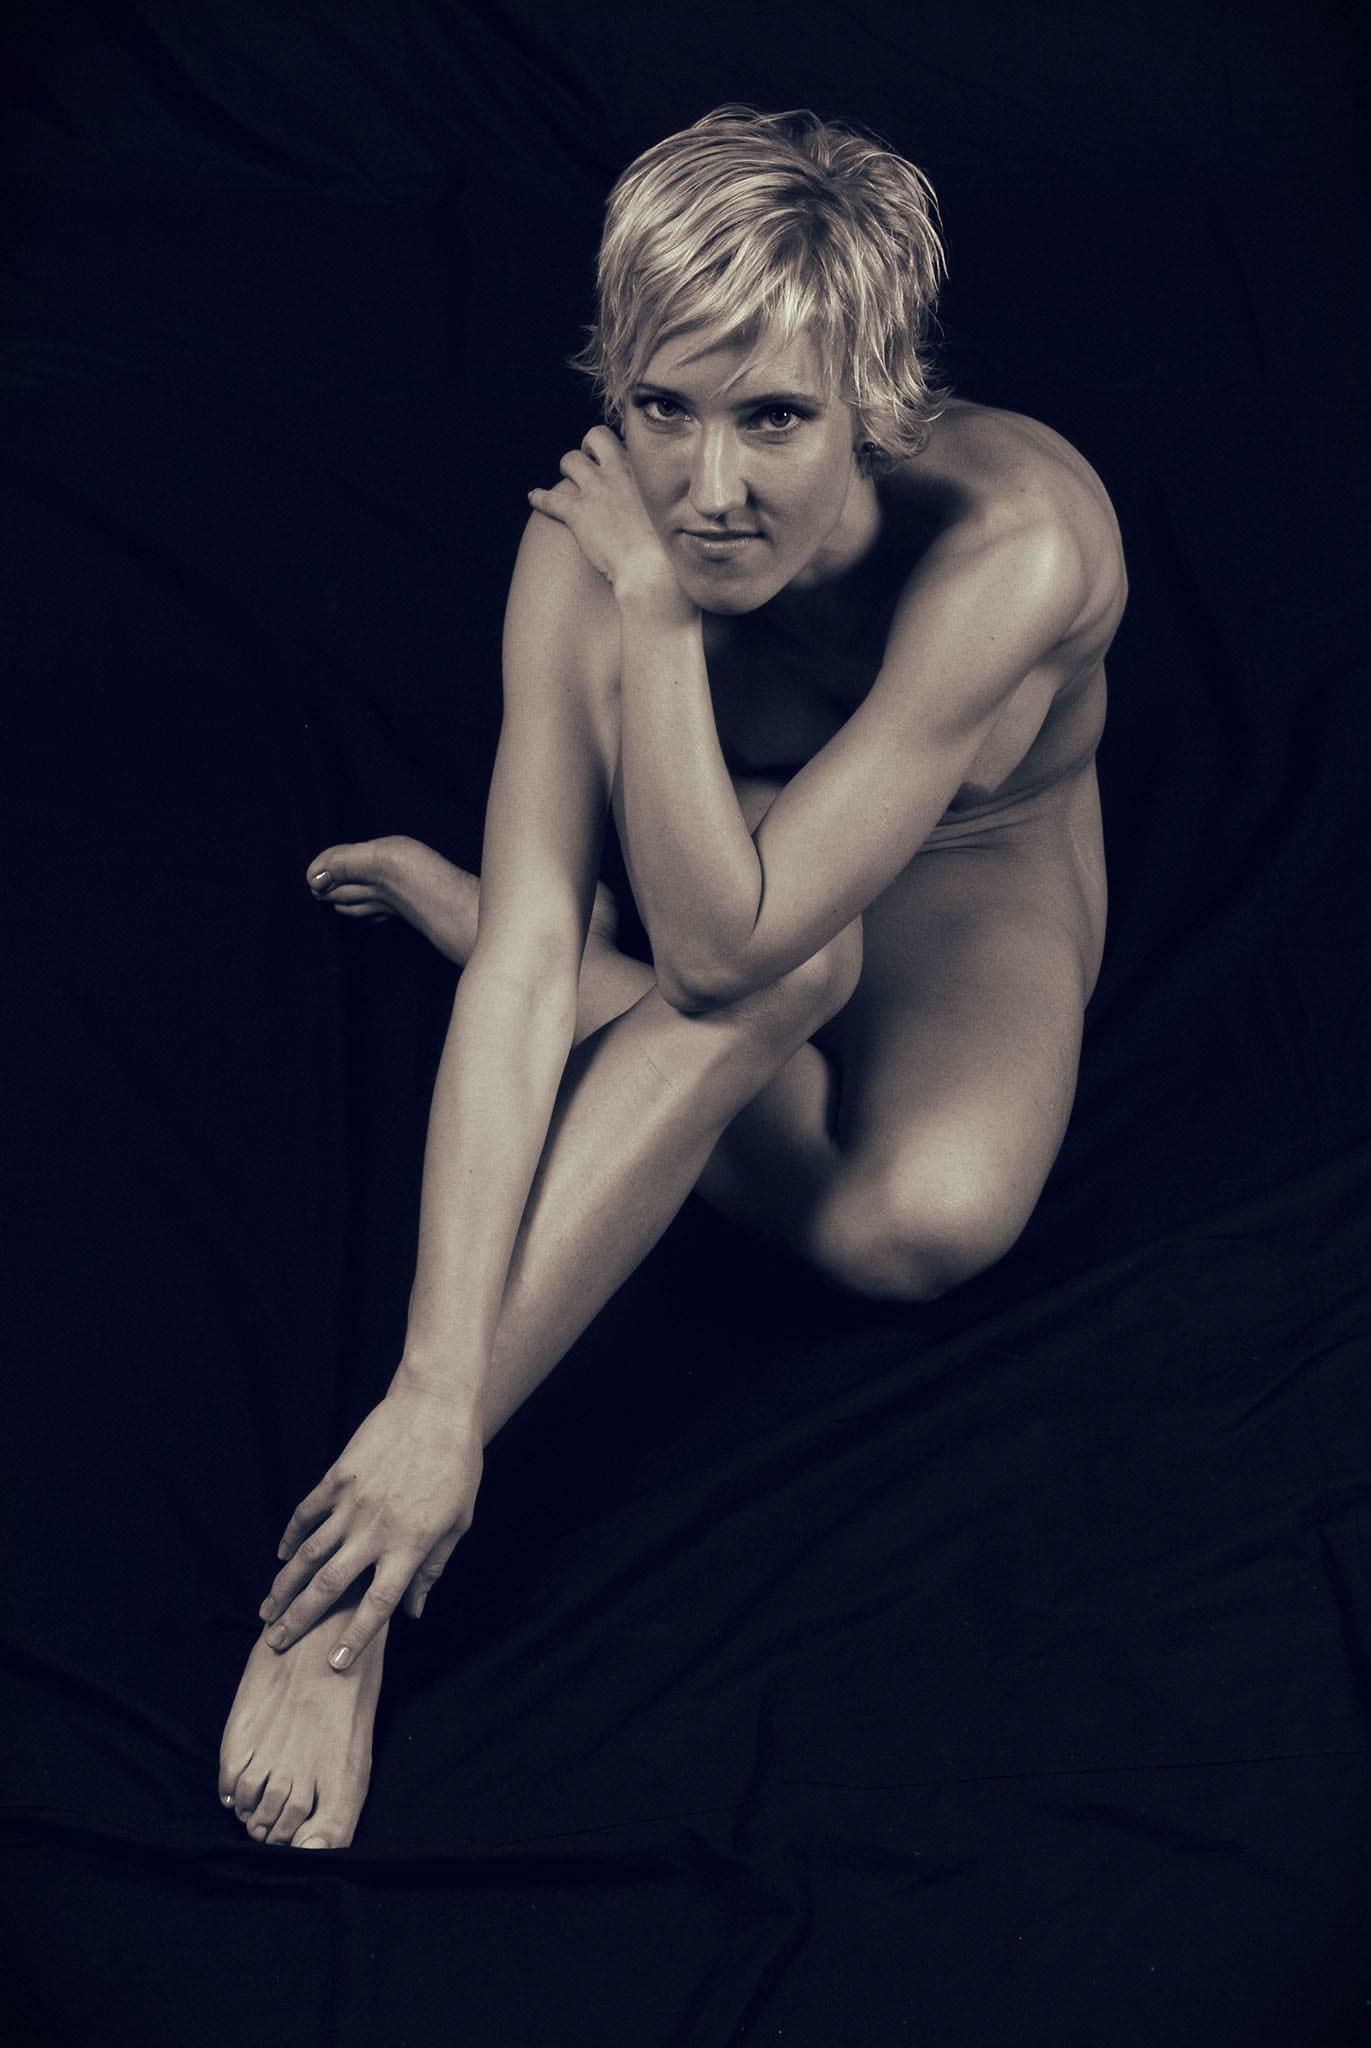 Akt 08 - Akt Nude Act Aktfotografie Erotik Erotic